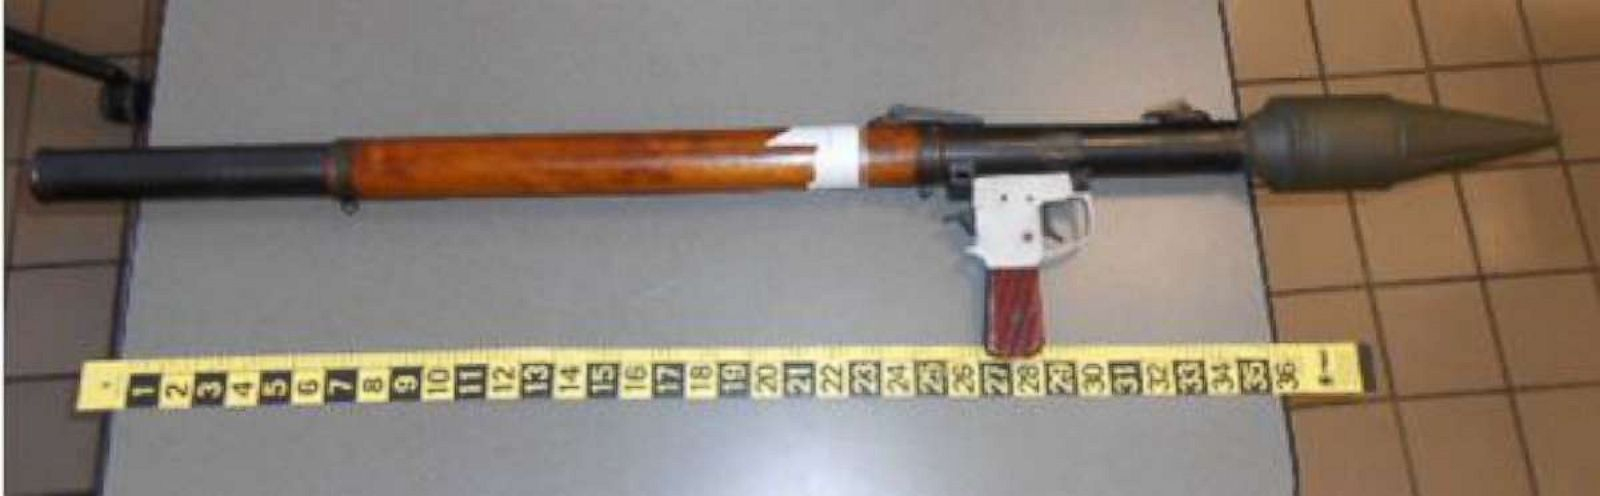 TSA confiscates rocket-propelled grenade launcher at Pennsylvania